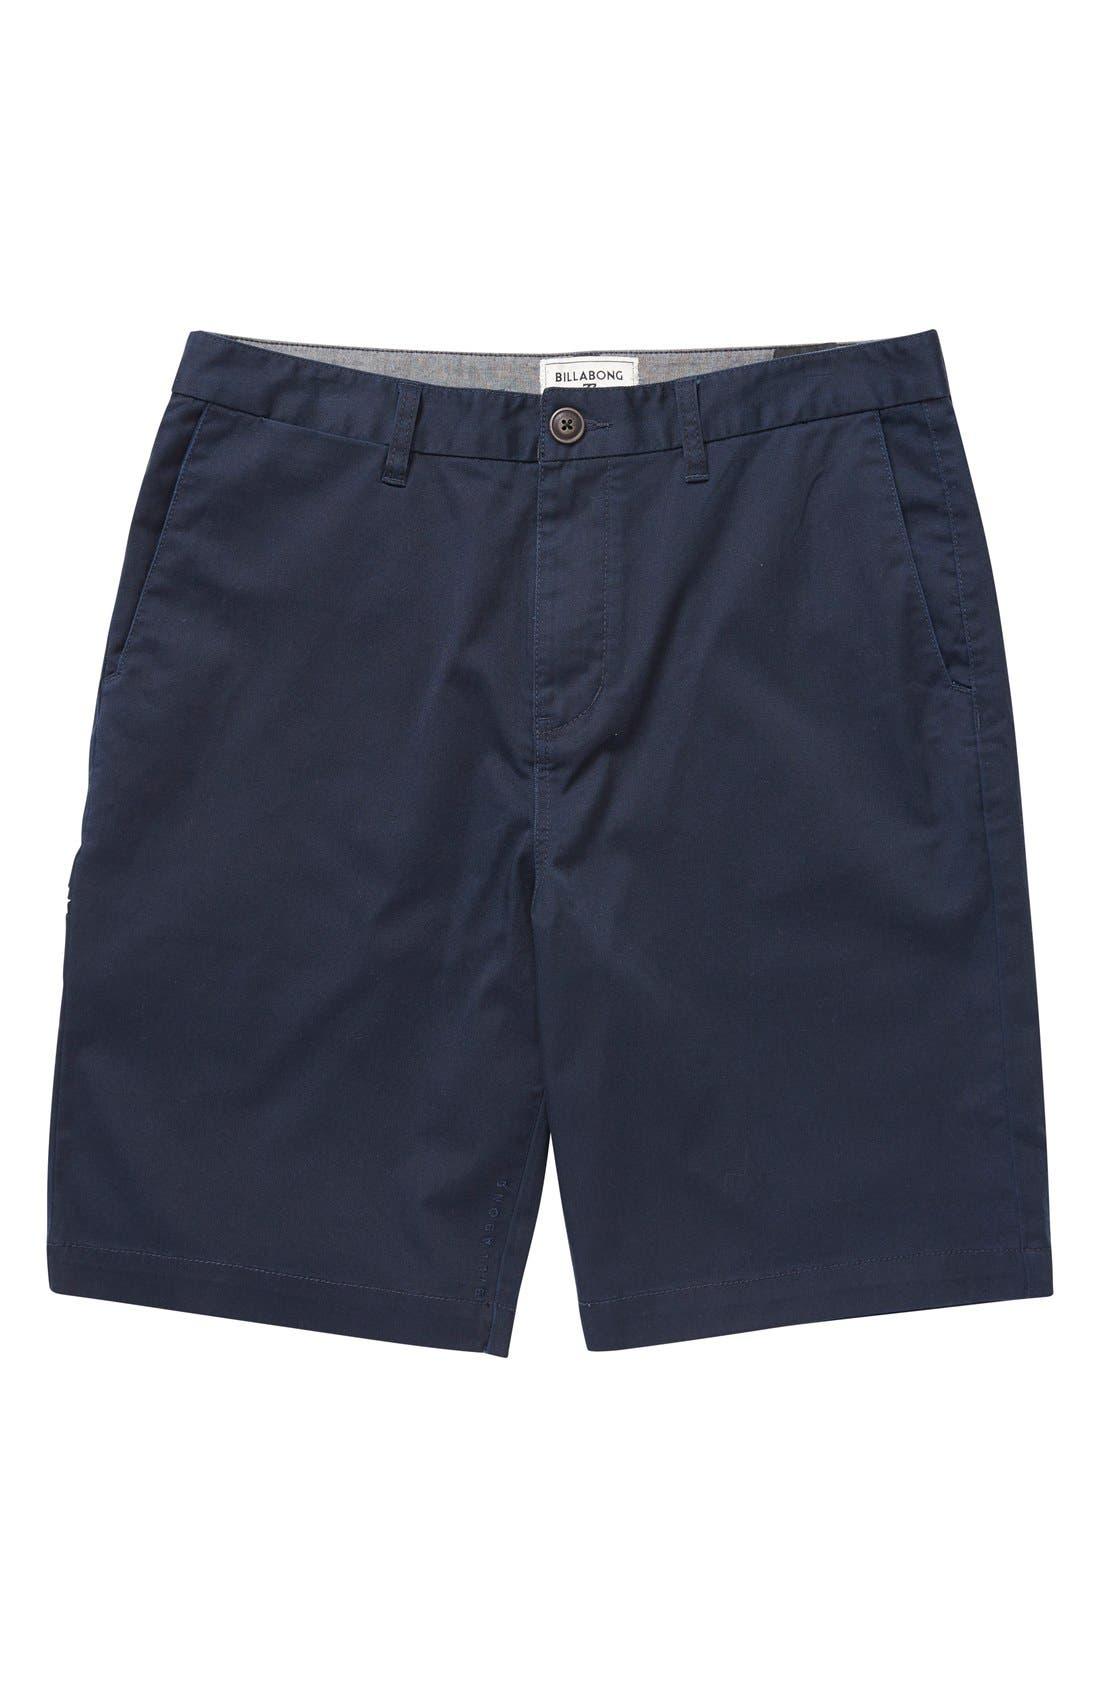 Billabong 'Carter' Cotton Twill Shorts (Toddler Boys & Little Boys)